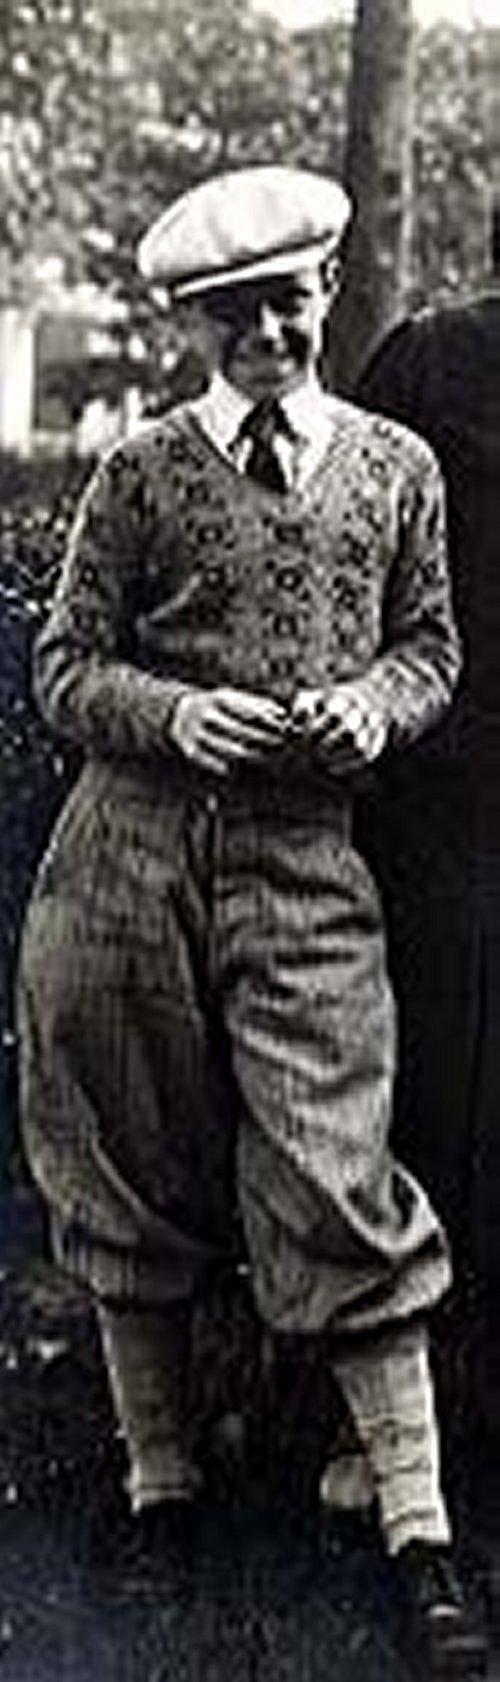 Photo of Francis DeLisle